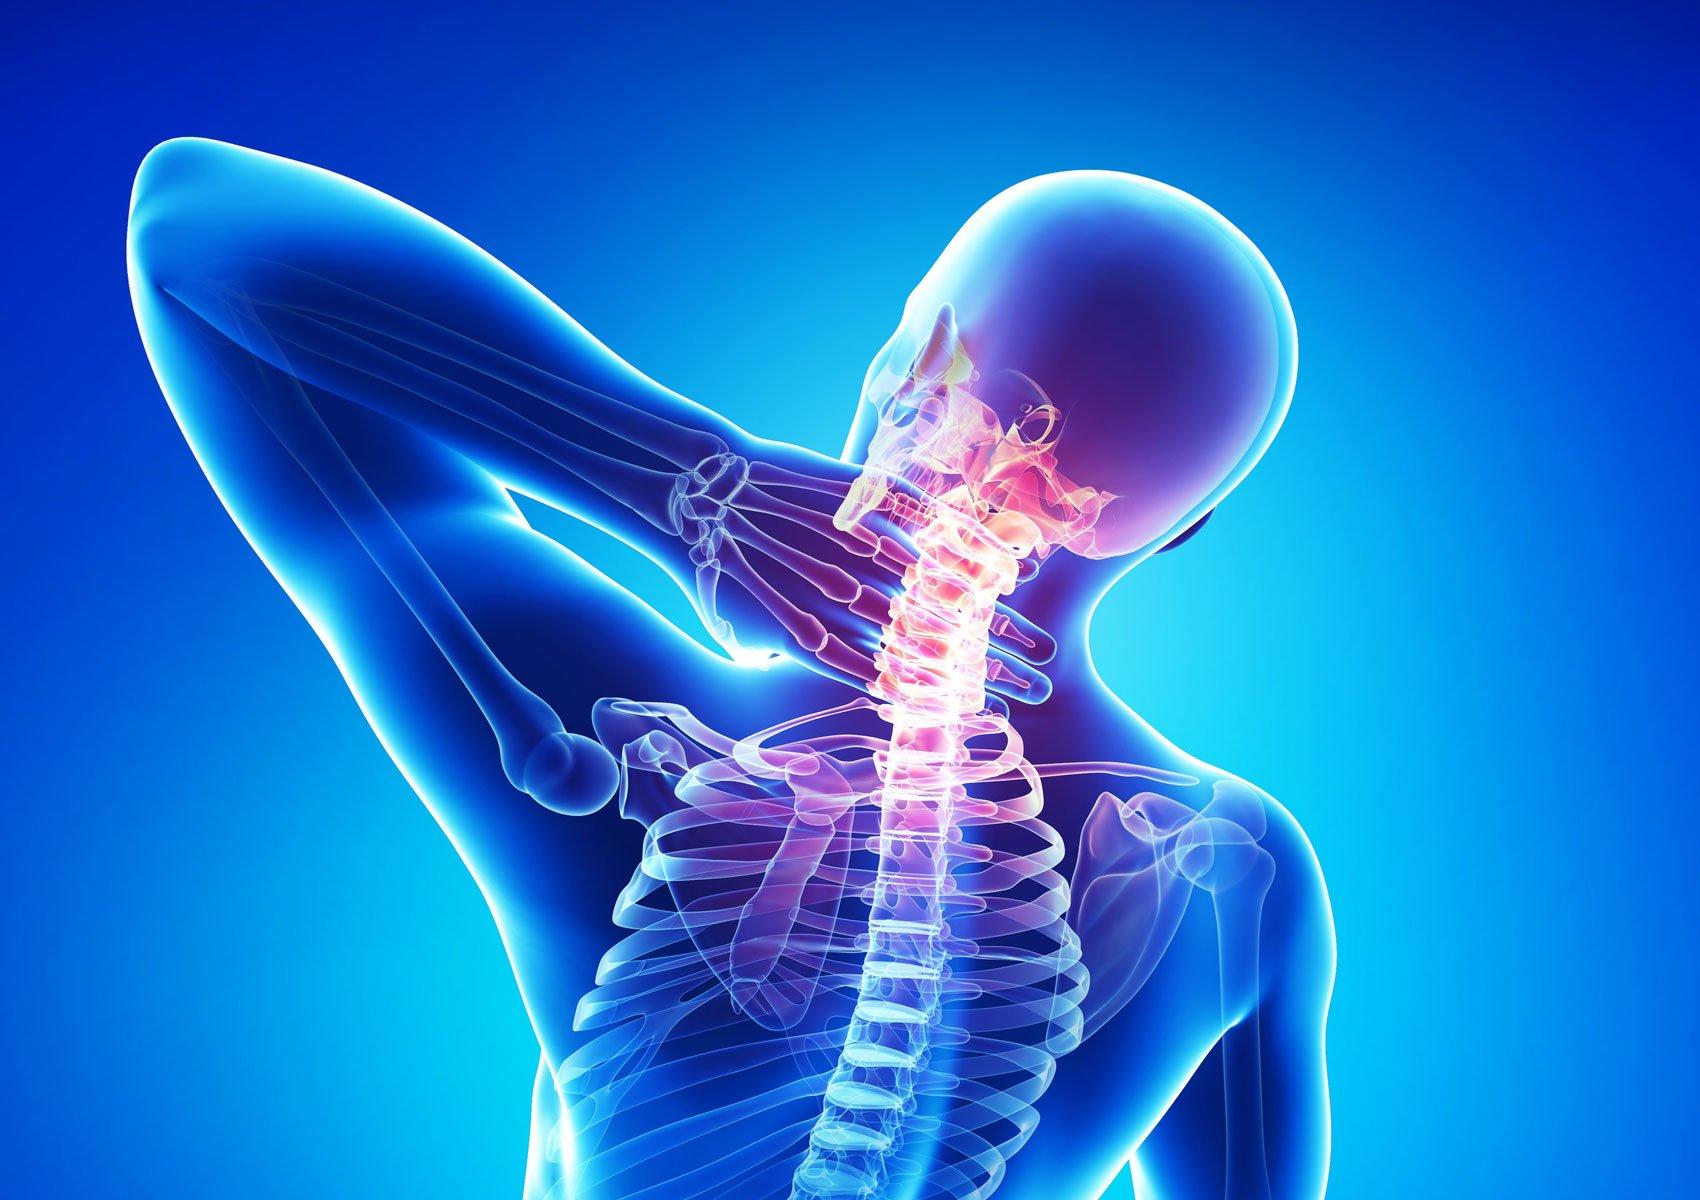 Методы лечения остеохондроза. Все «за» и «против»